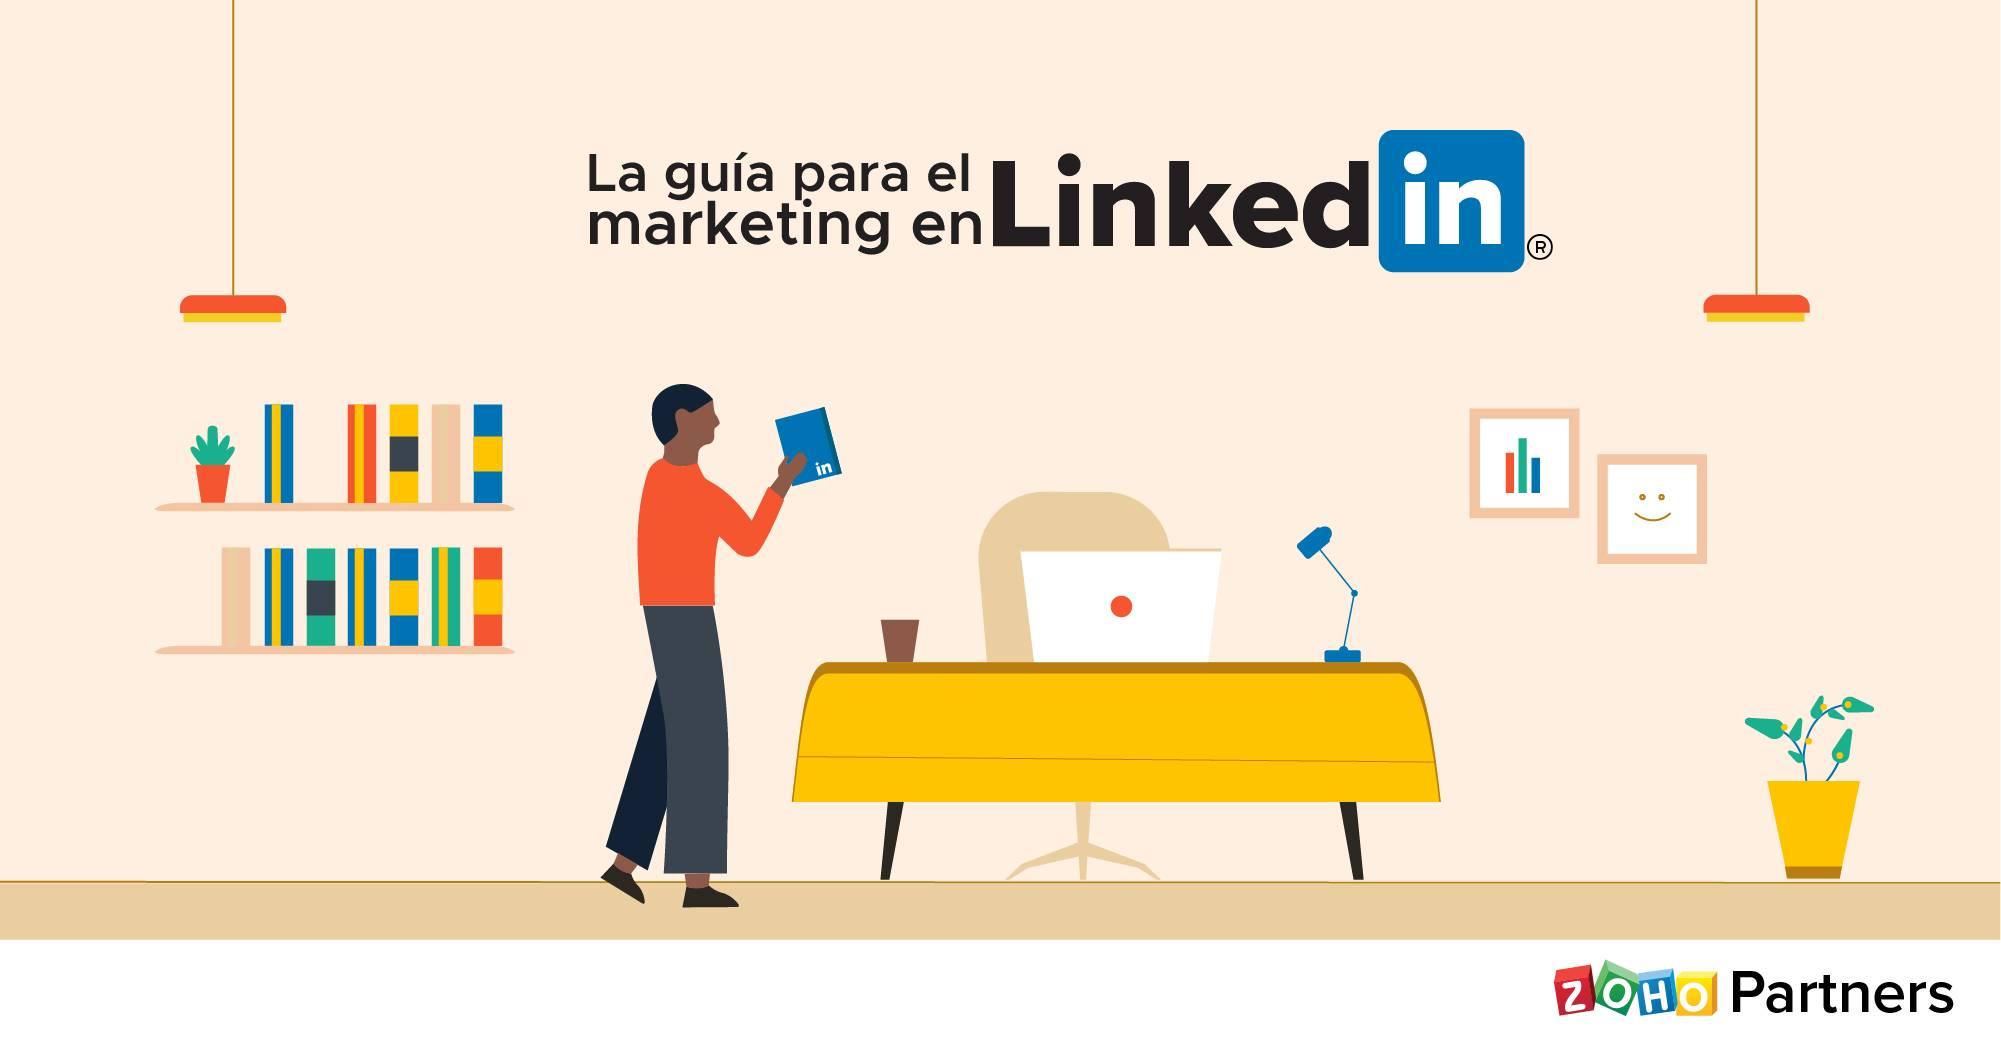 la guia para el marketing en LinkedIn